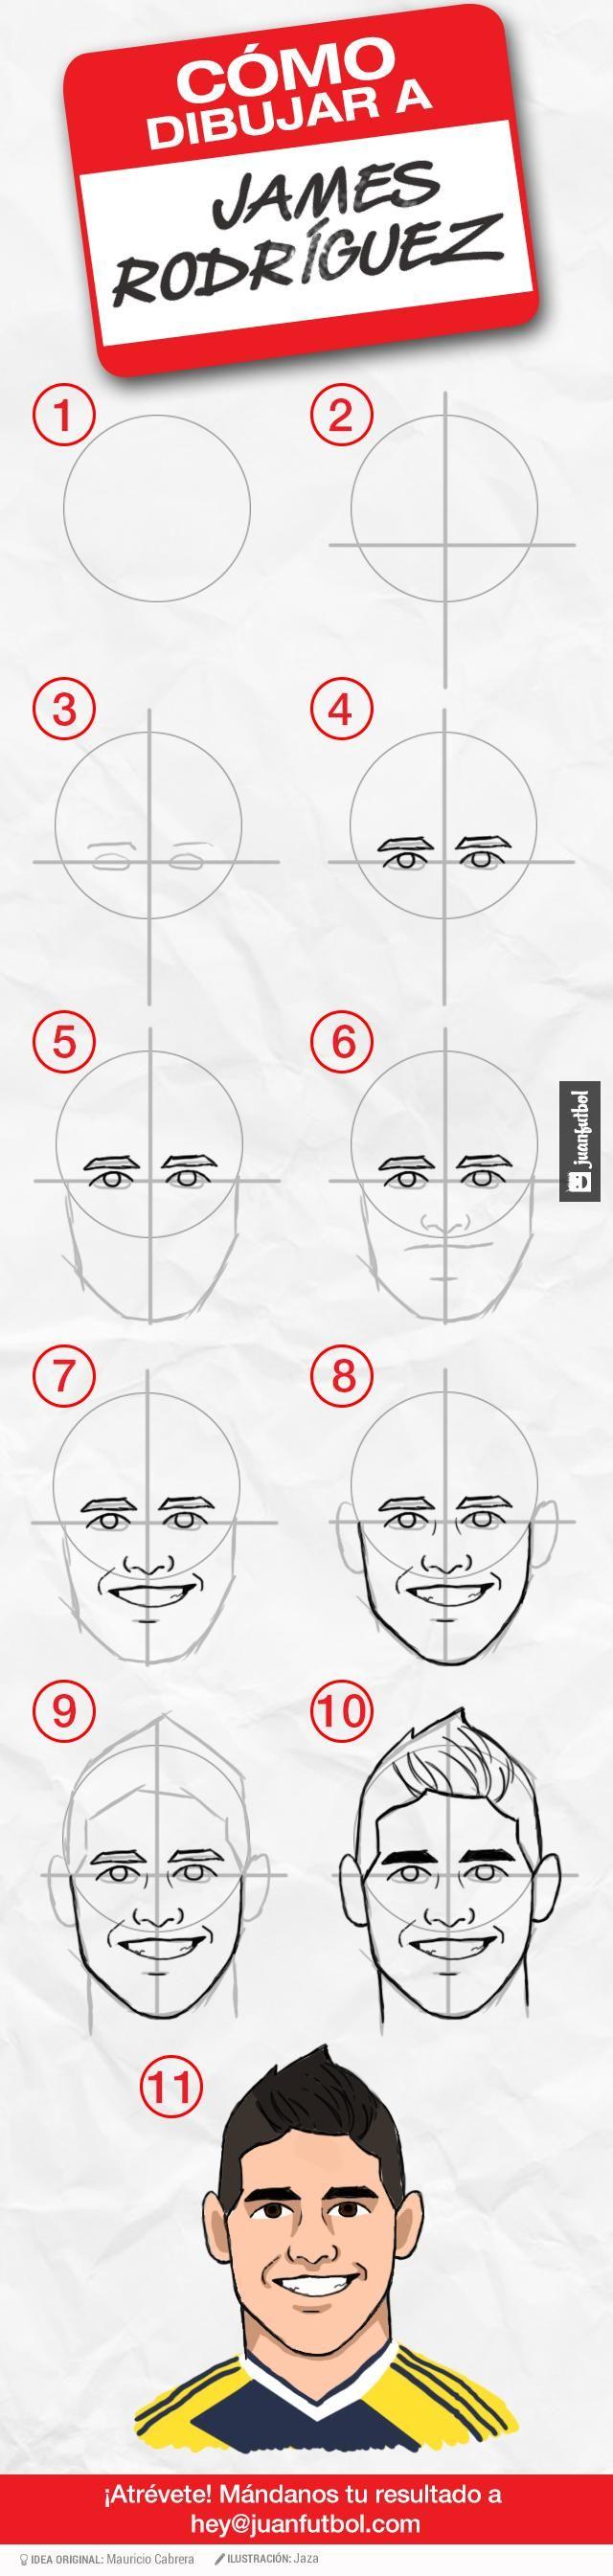 Tutorial de cómo dibujar a james rodríguez